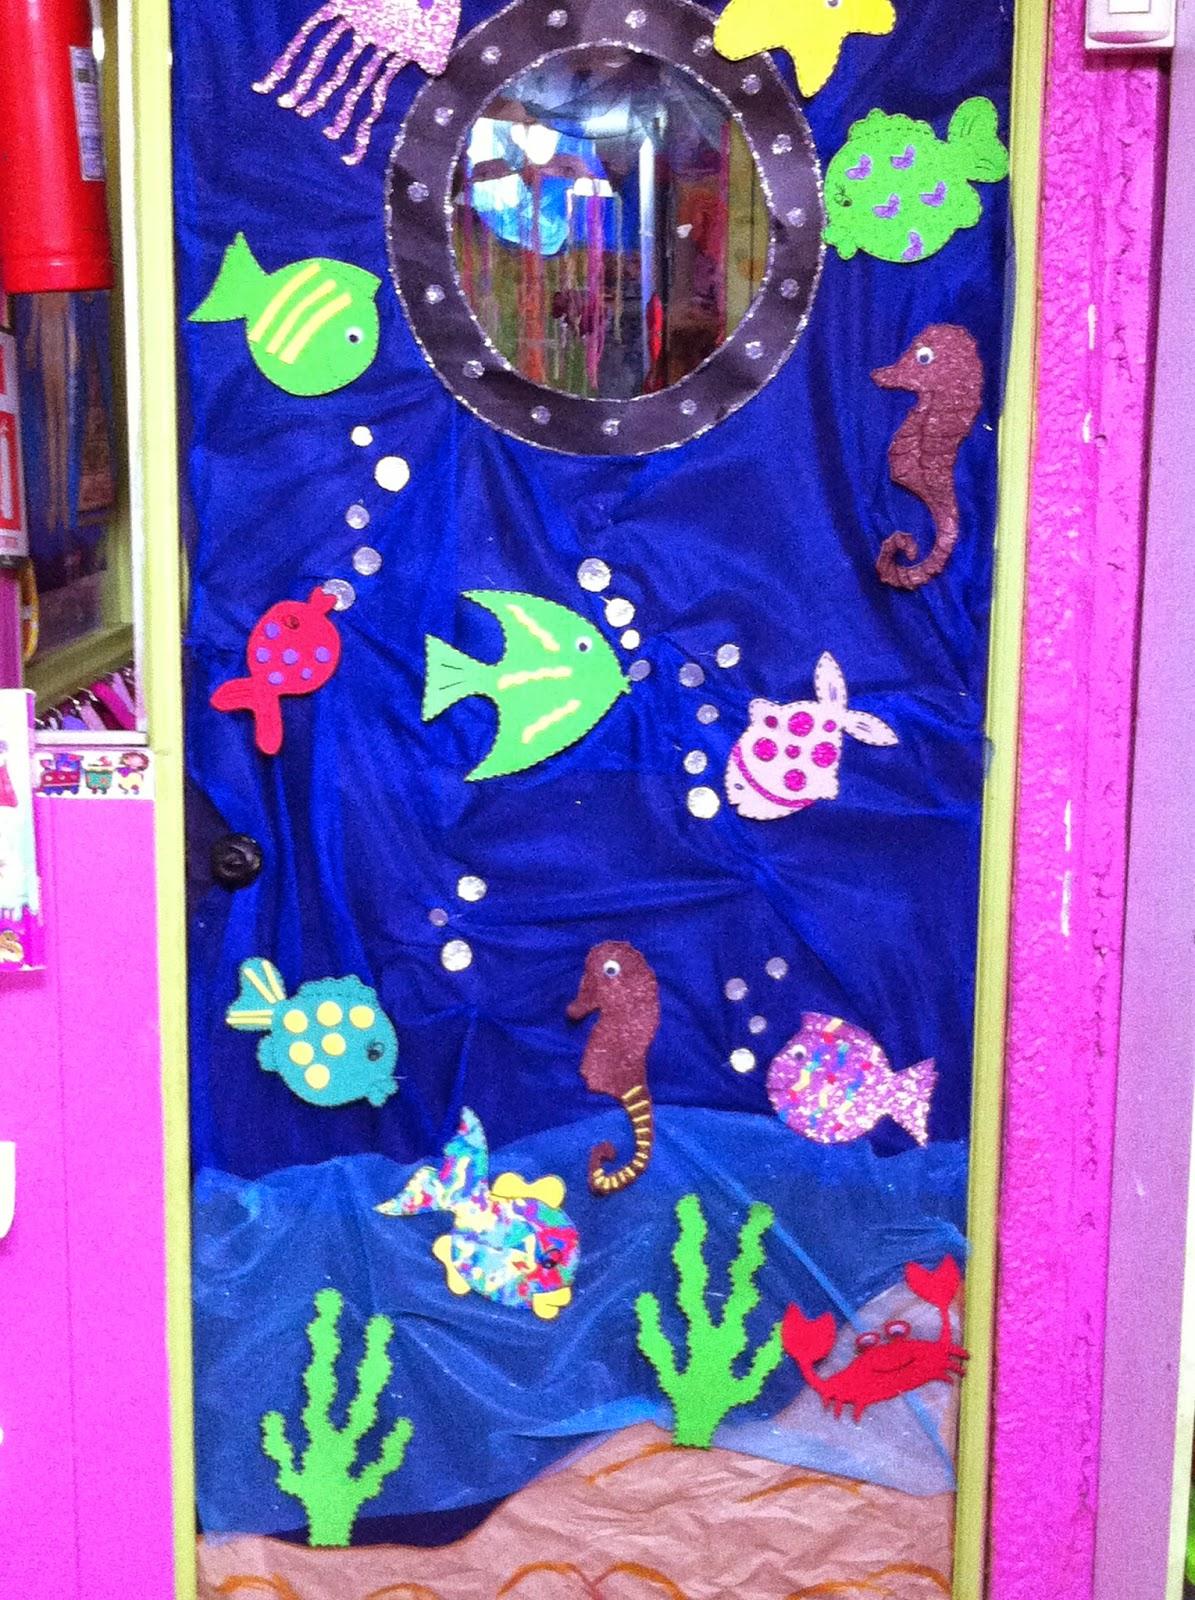 Jard n infantil un mundo de amor muestra de decoraci n for Amaru en la puerta de un jardin